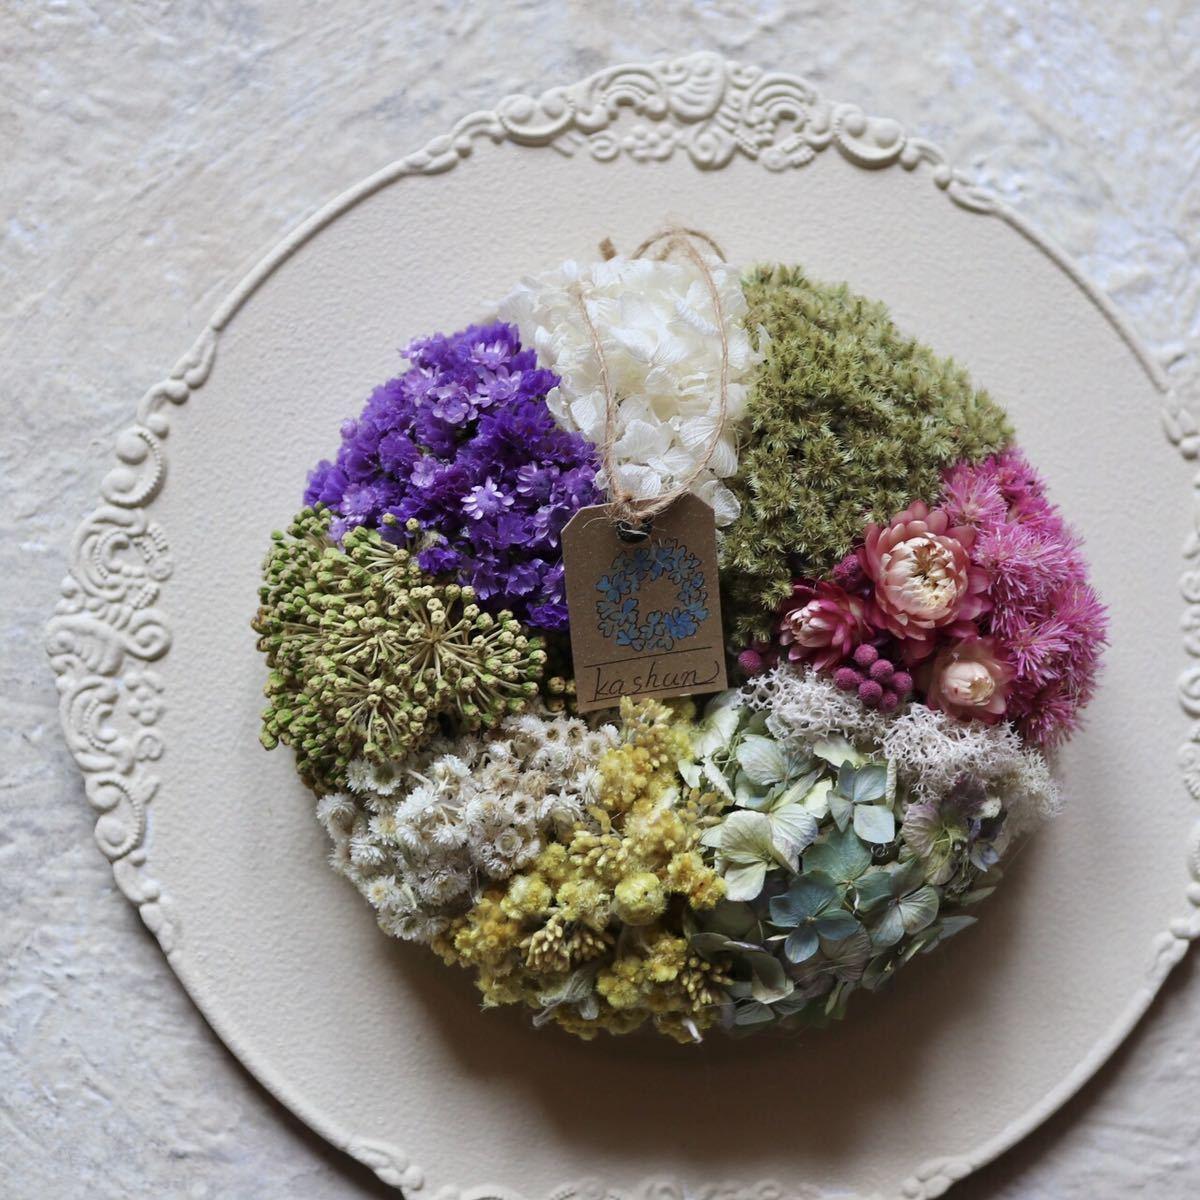 *kashun* (19cm)ハンドメイド コロンとしたお菓子みたいなカラフルリース/ドライフラワー/壁飾り/誕生日プレゼント/お祝い/新築祝い_画像1